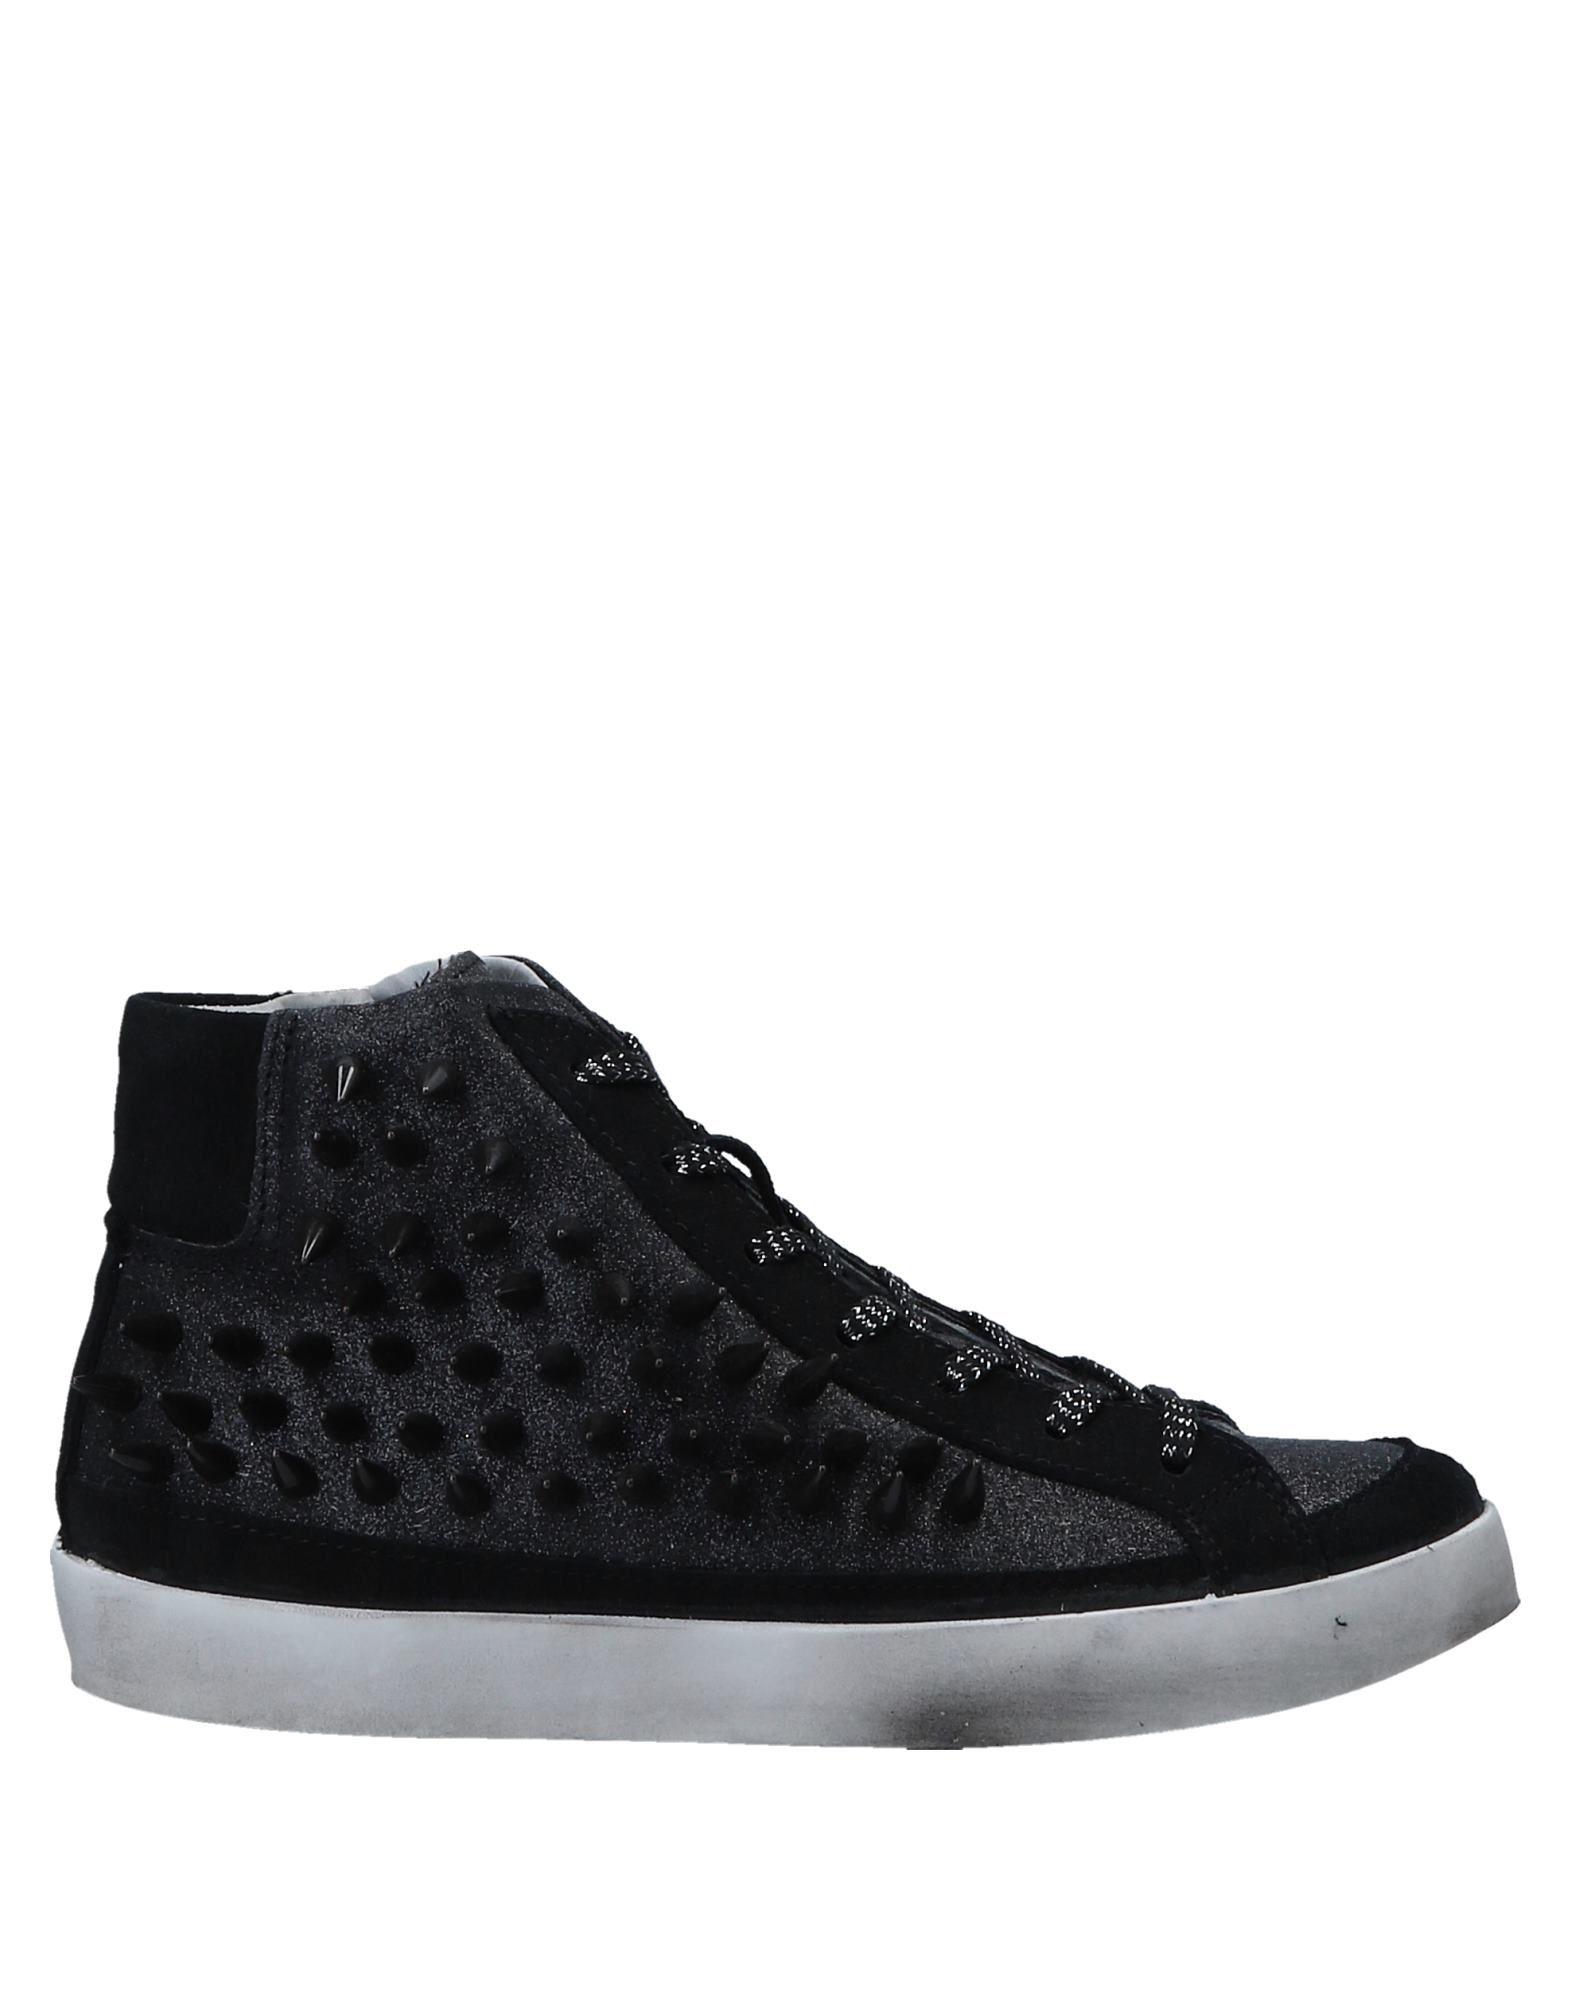 2Star Sneakers online - Women 2Star Sneakers online Sneakers on  Australia - 11559046SV 8298bb